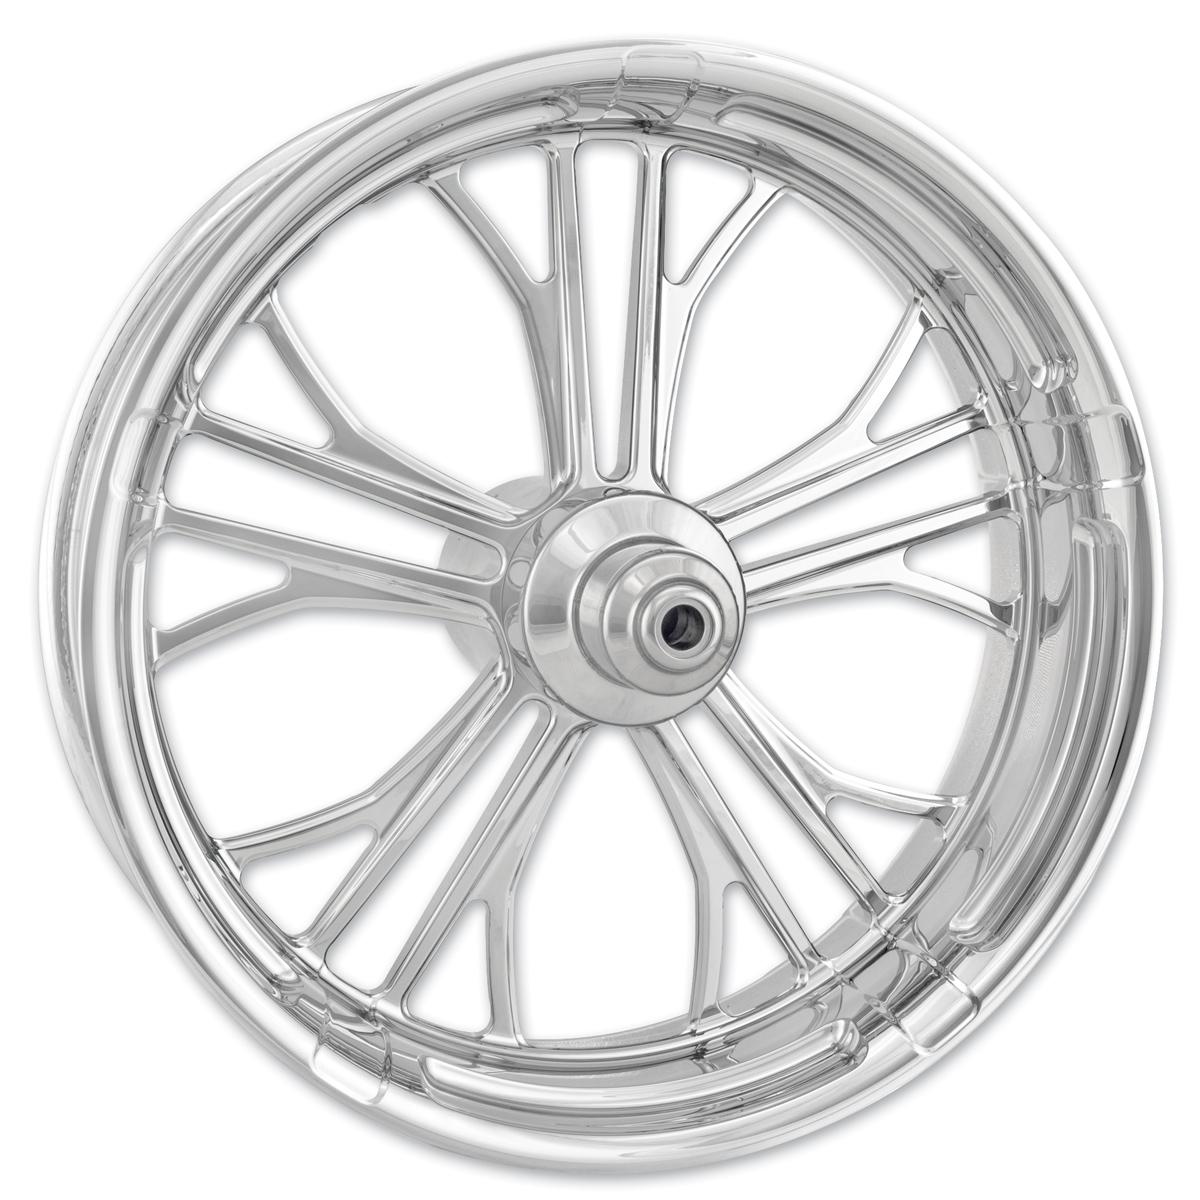 Performance Machine Dixon Chrome Rear Wheel 17x6